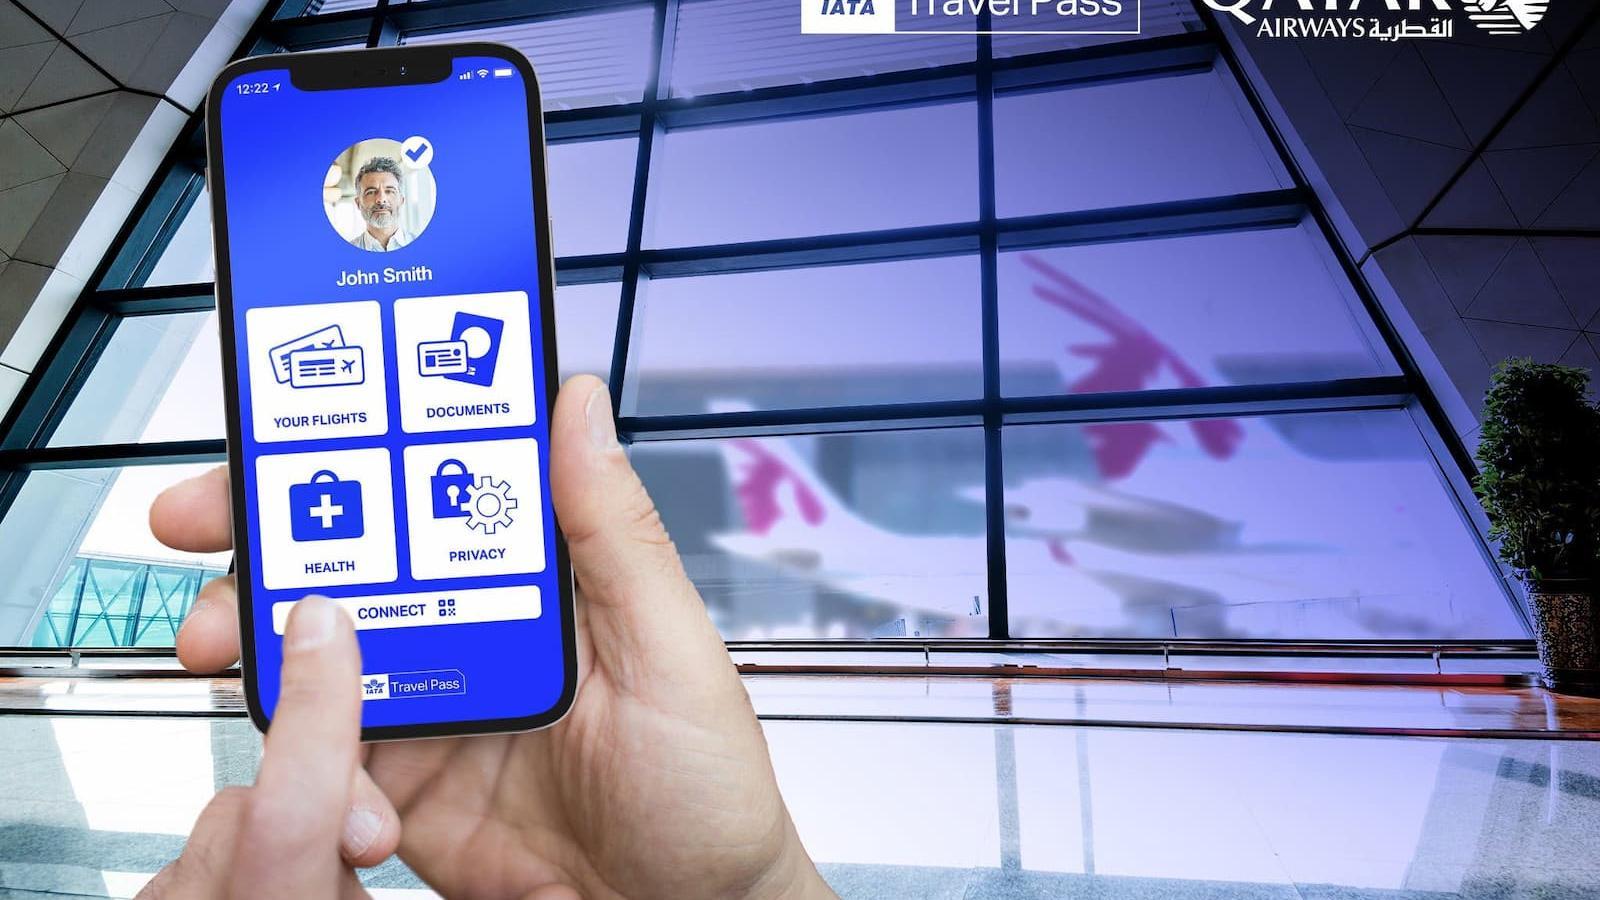 Qatar Airways first airline to integrate vaccination certificates in IATA Travel Pass 'Digital Passport' Mobile App